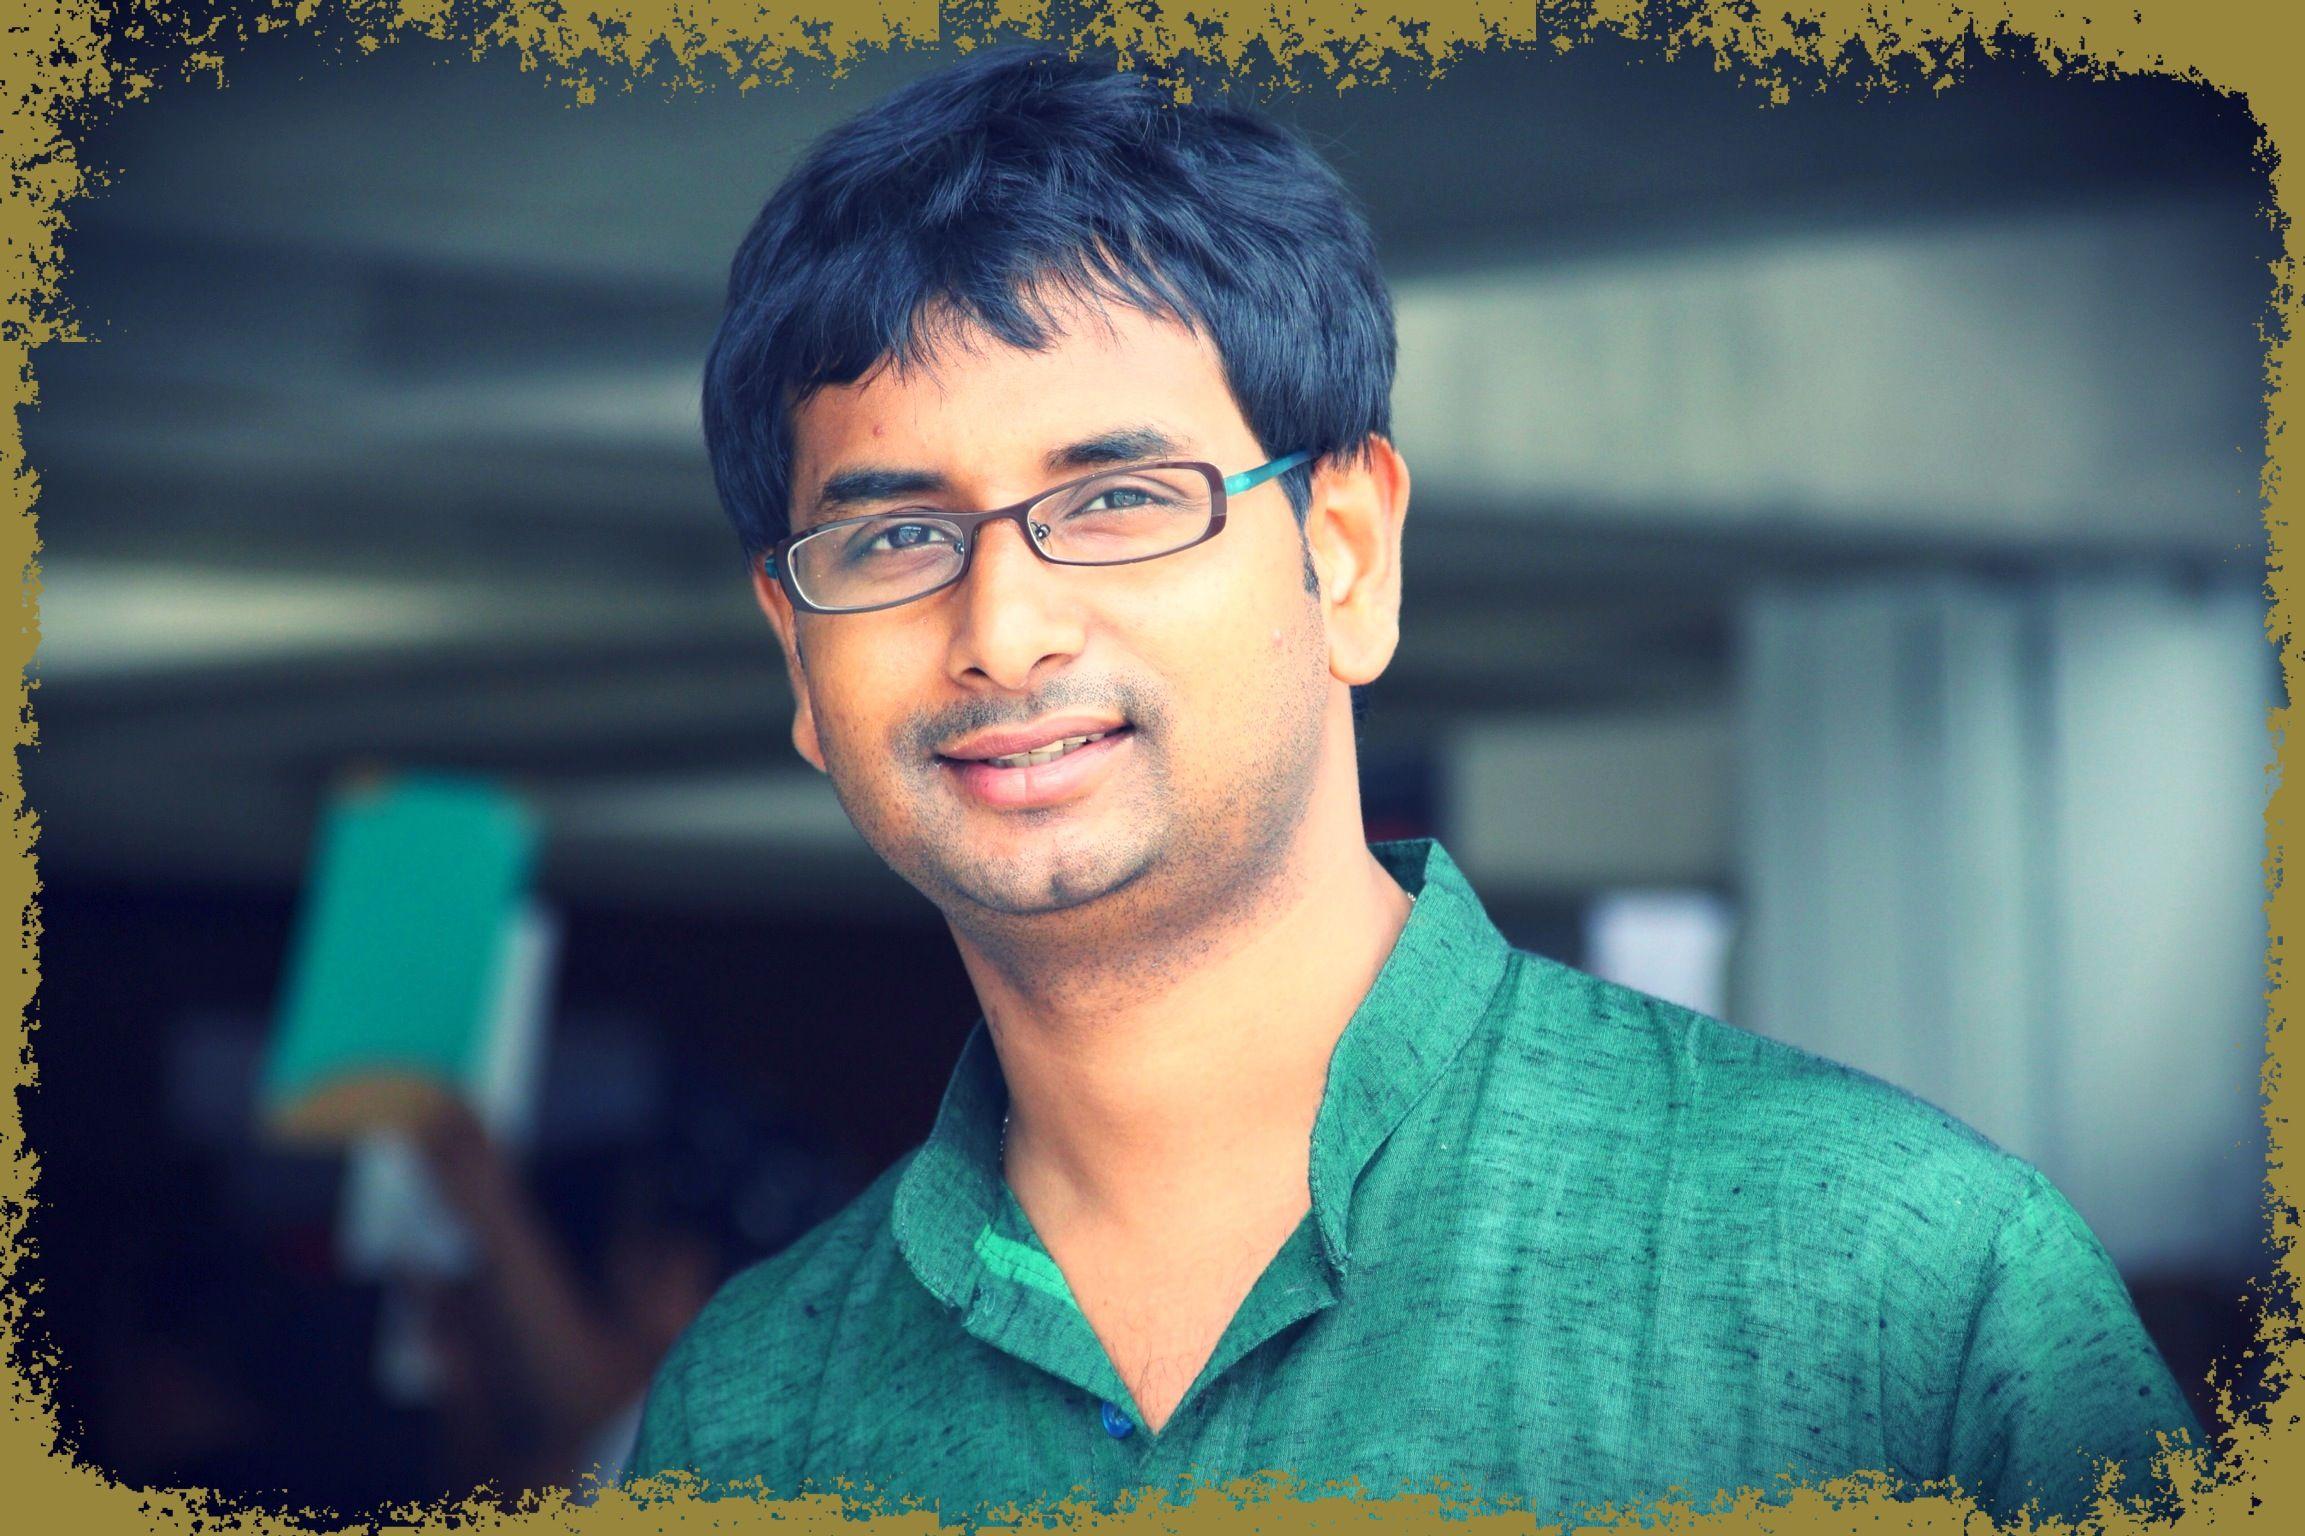 Amitabh's Profile Pic.JPG